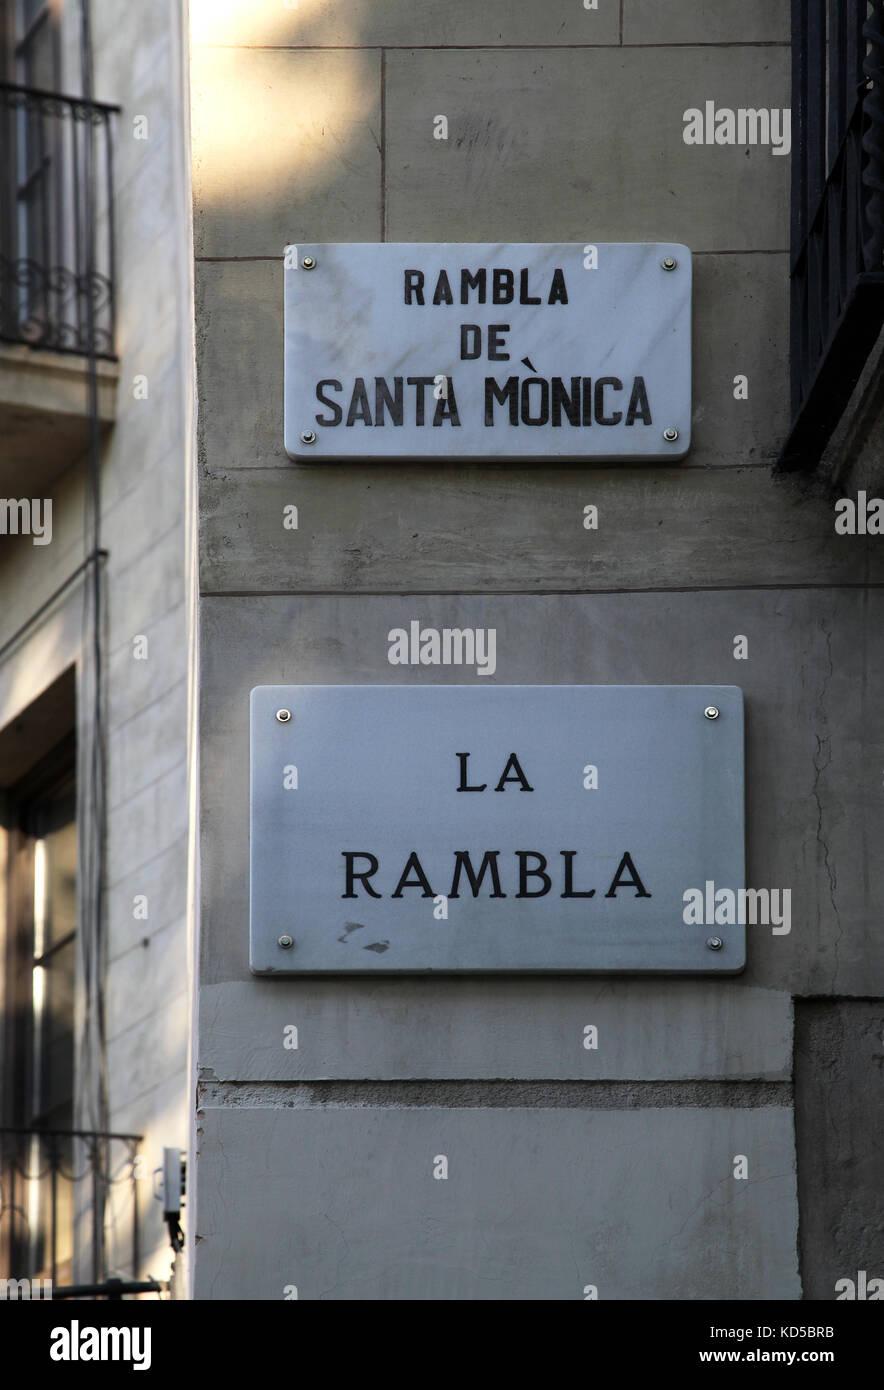 Rambla de Santa Monica Street sign in Barcelona Catalunya Spain - Stock Image